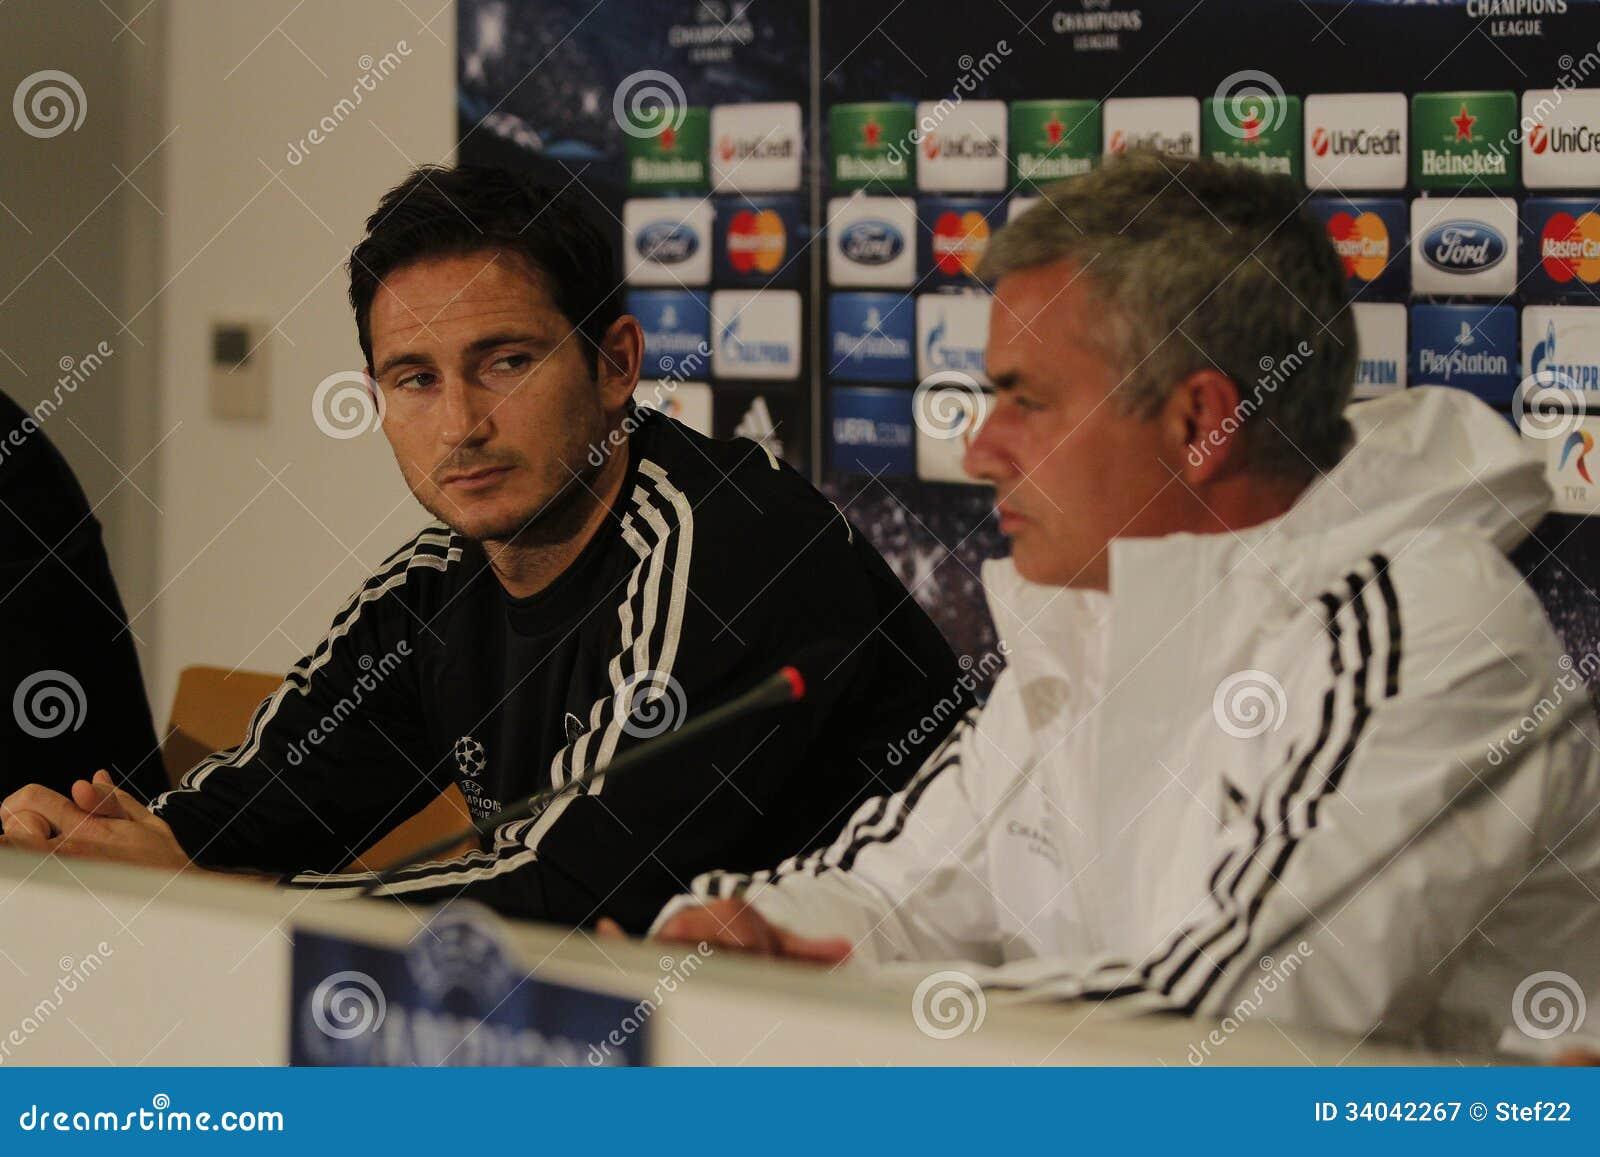 Jose Mourinho und Frank Lampard